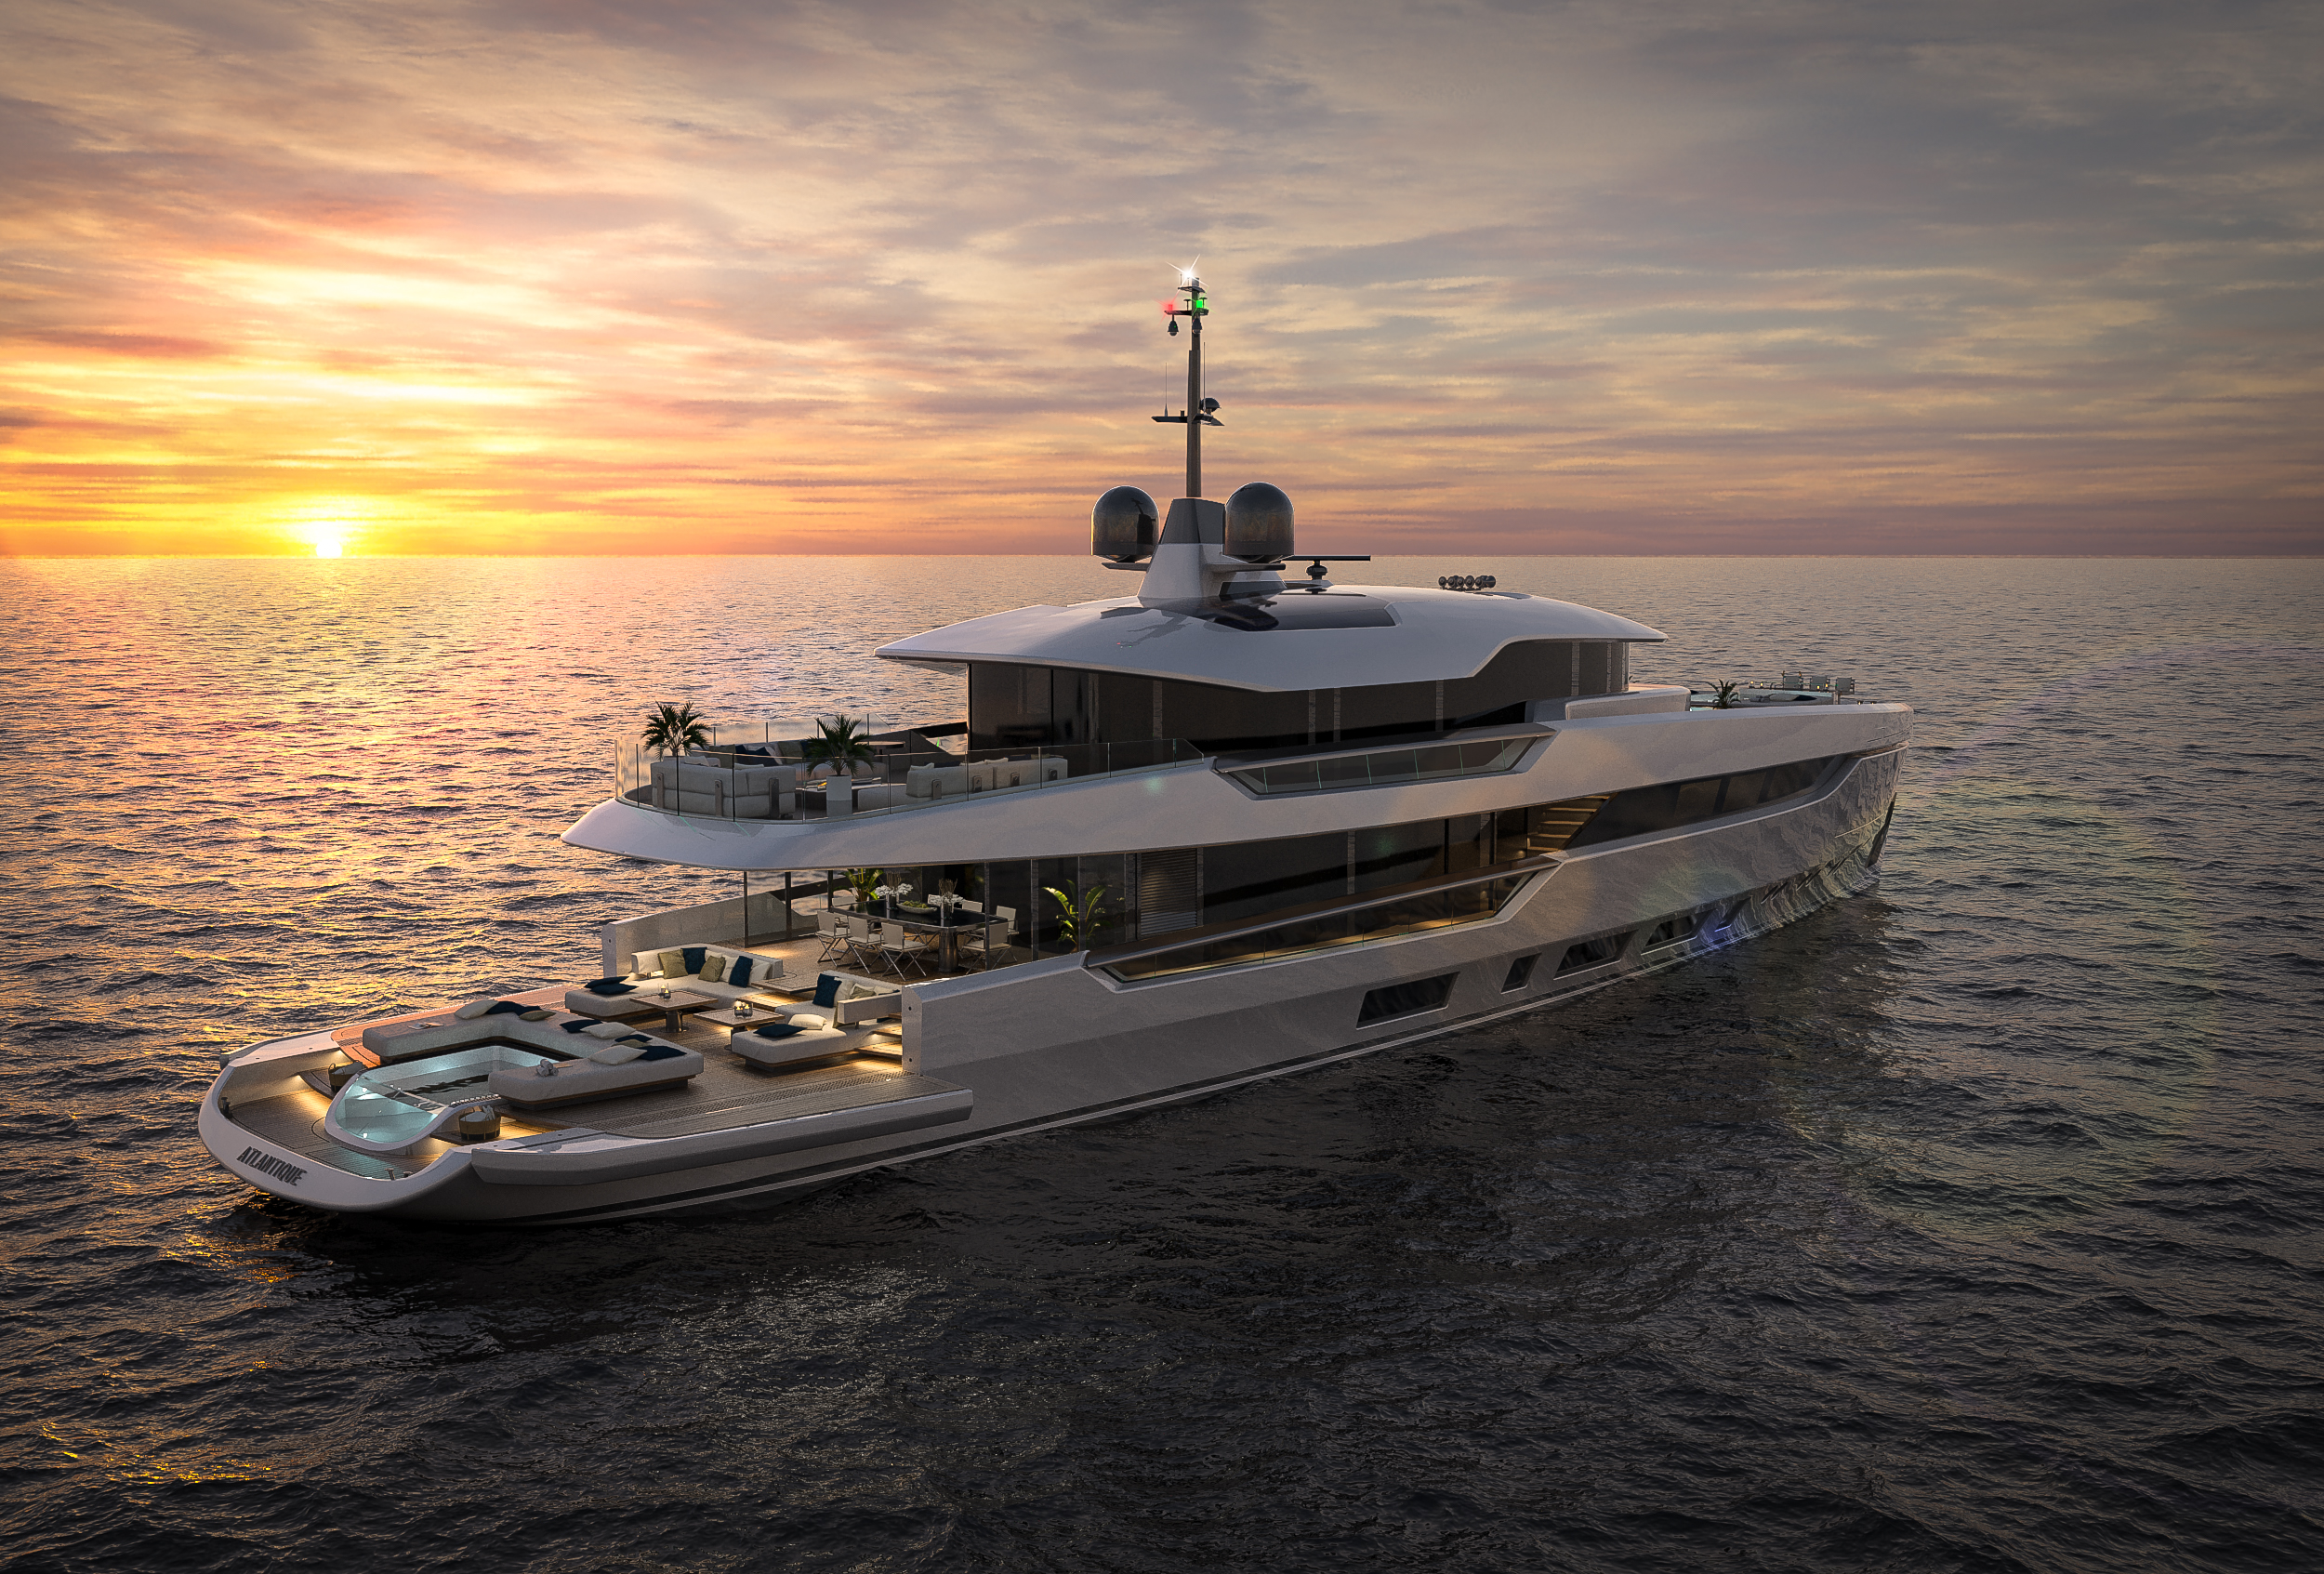 columbus-atlantique-boat-shopping-1